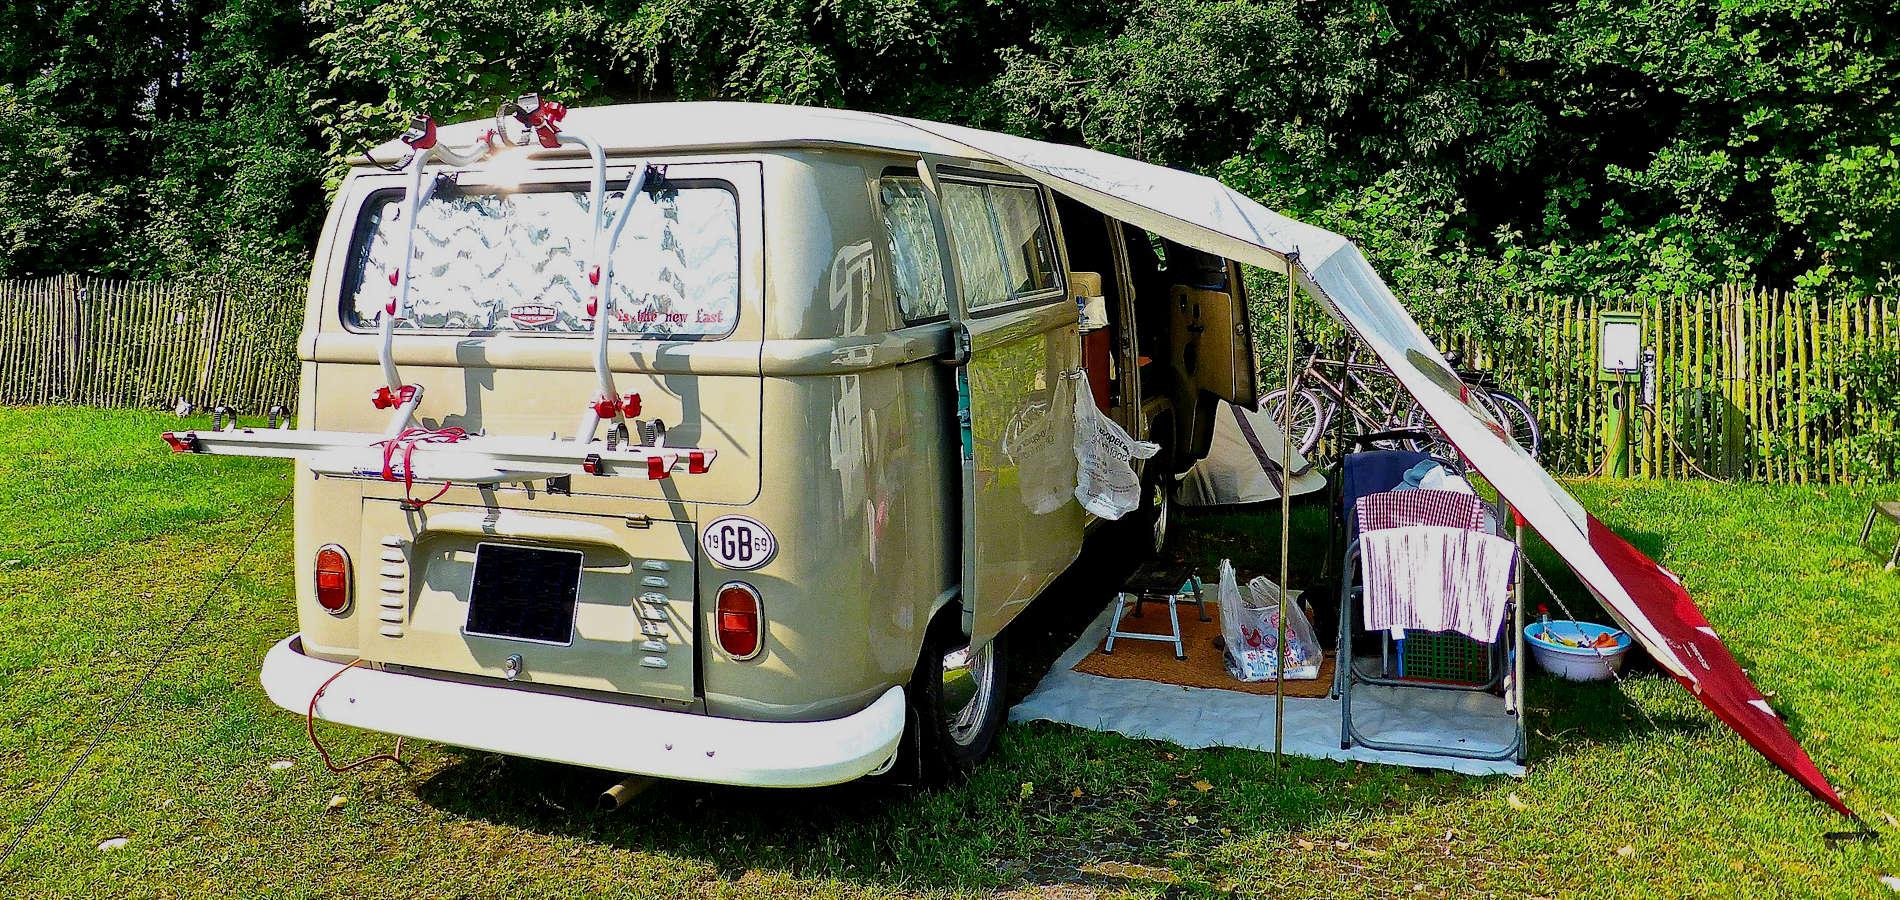 Organisation en camping et rangement